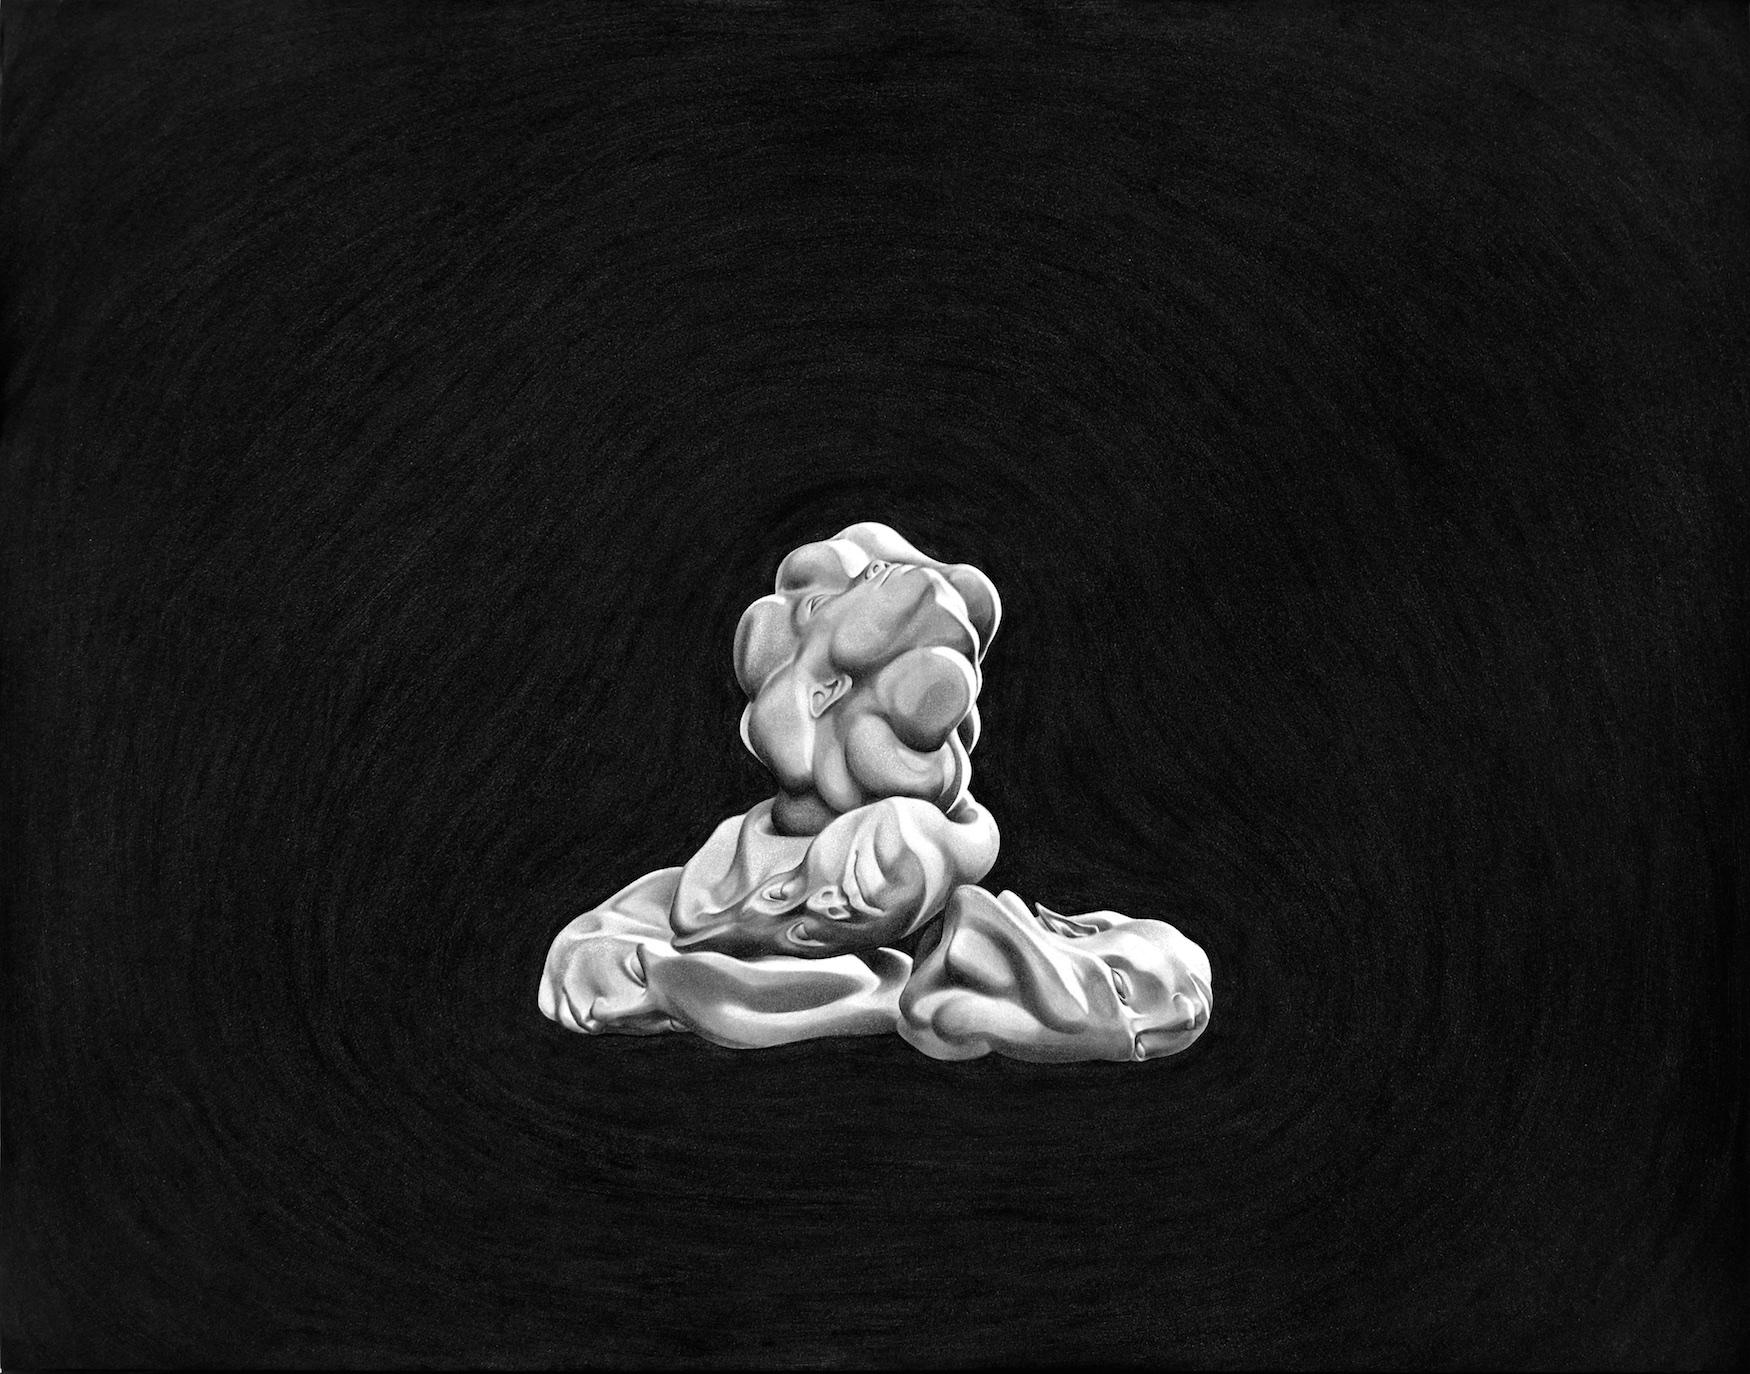 """ST (monstruos)"" (5), 2012. Oleo sobre papel montado sobre aluminio. 50x70 cm."